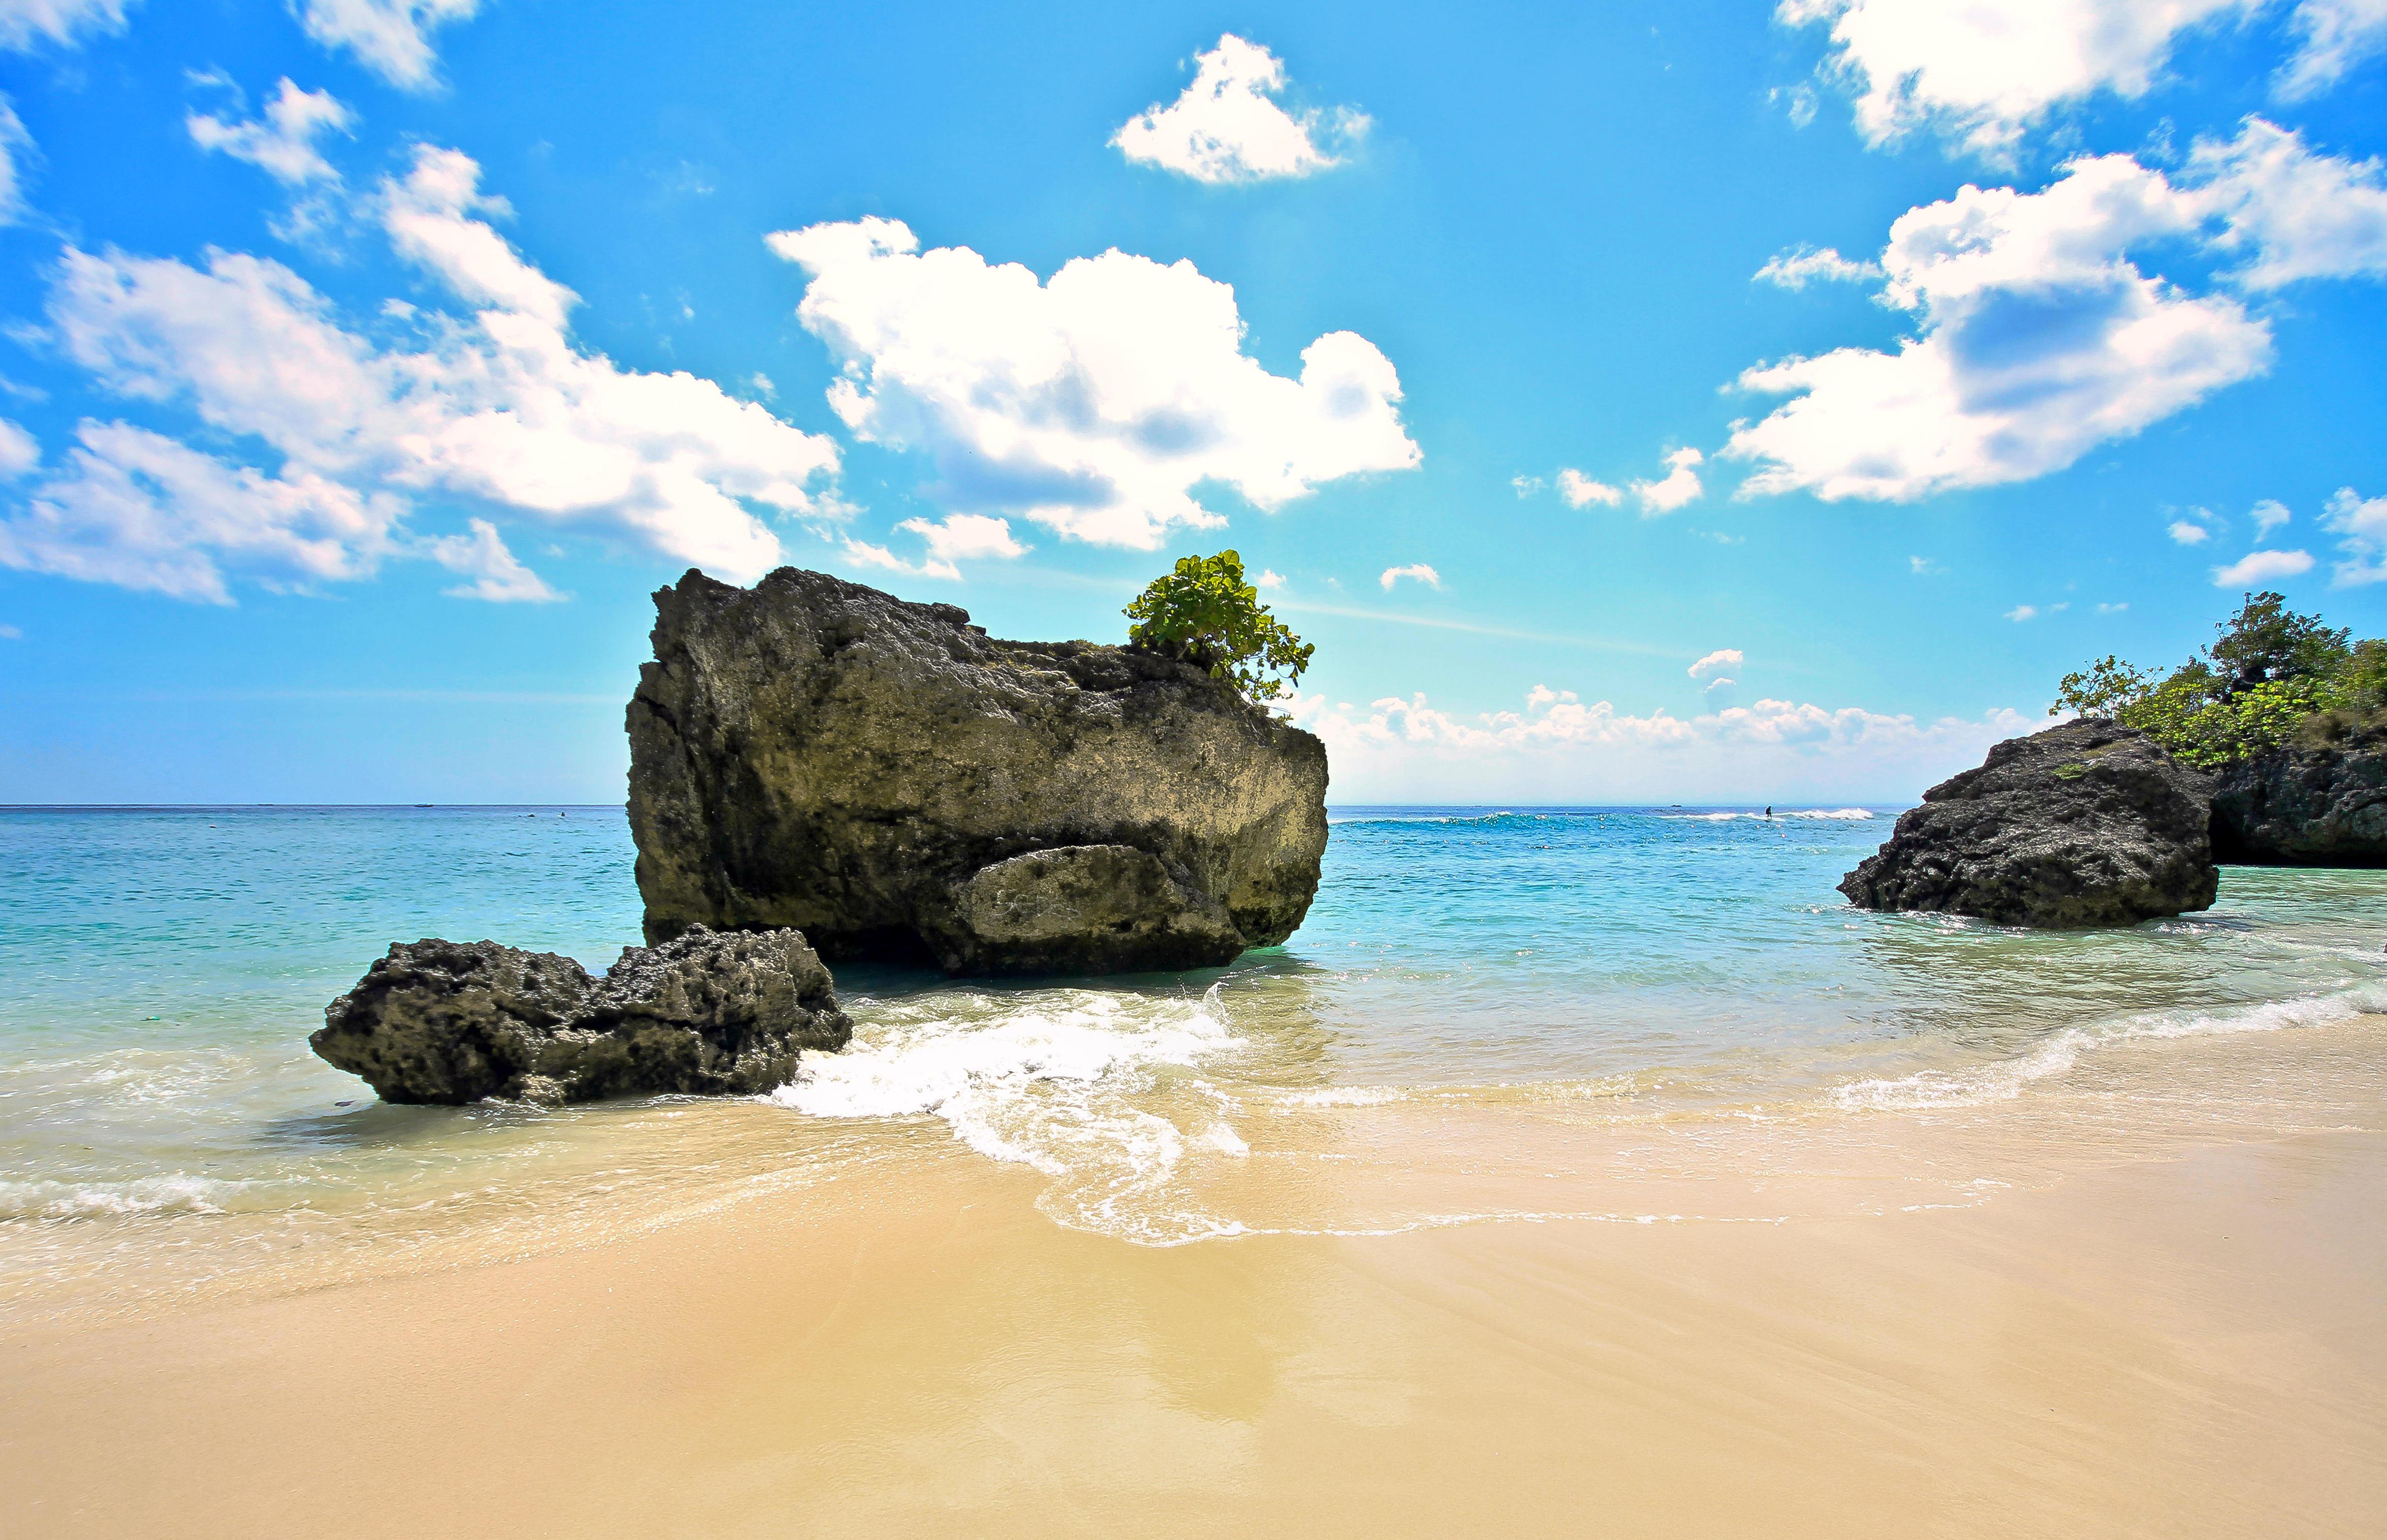 обои море, пляж, камни картинки фото